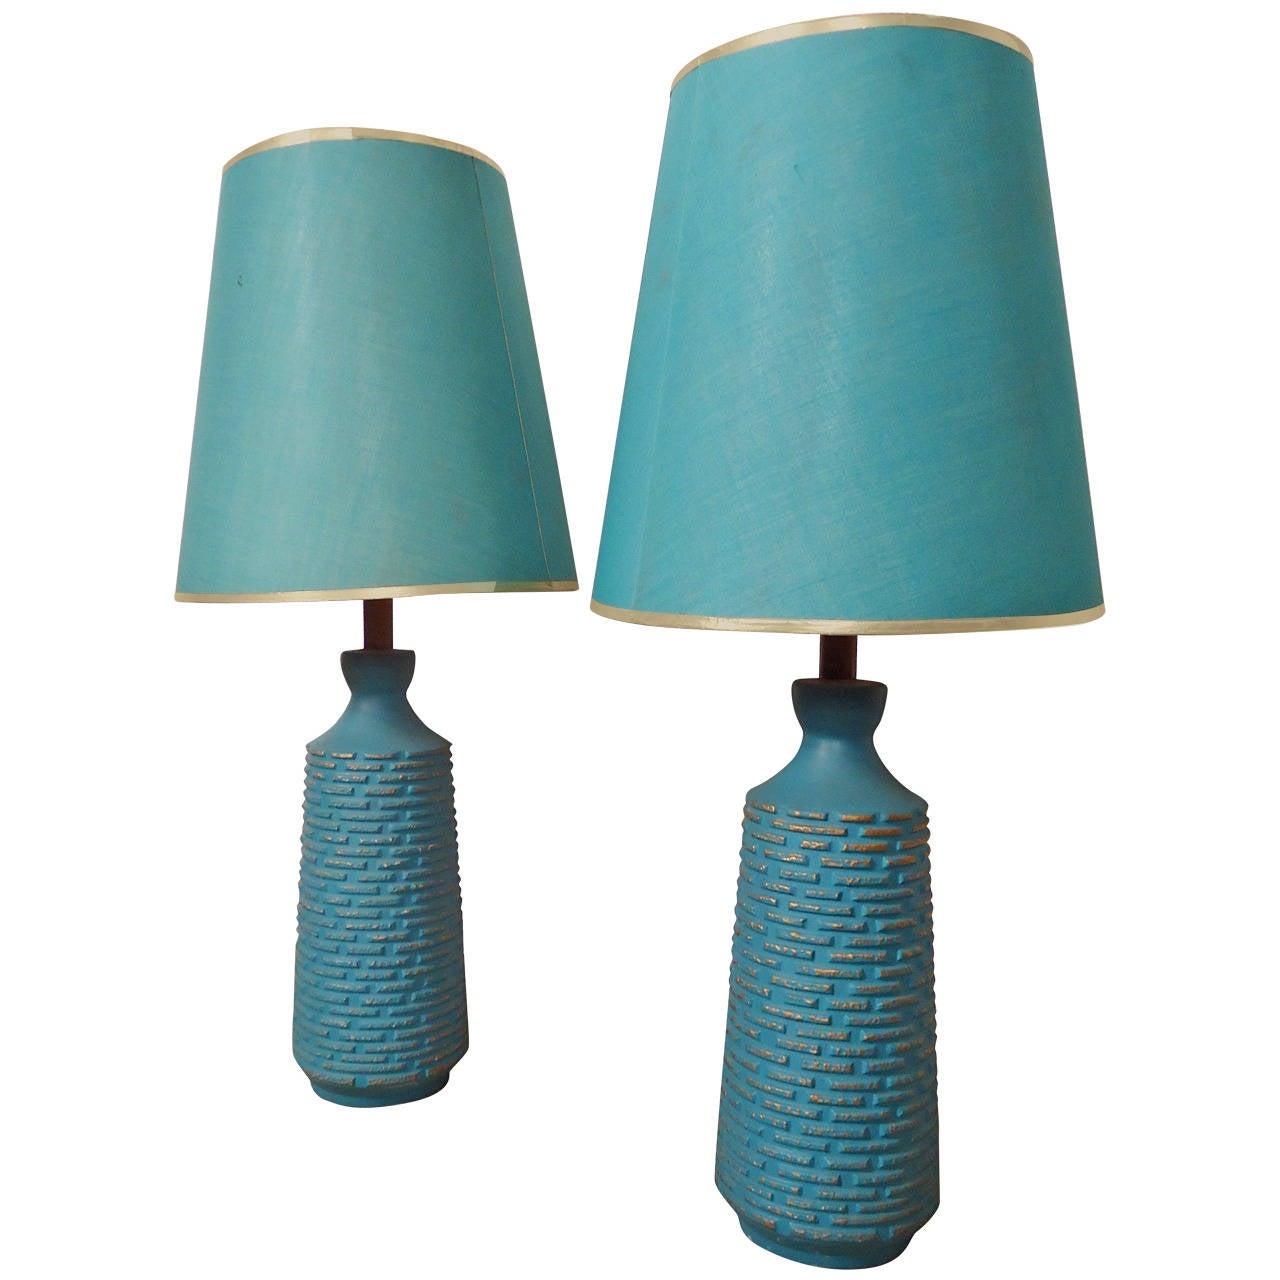 Vivid Teal And Gold Table Lamps At 1stdibs